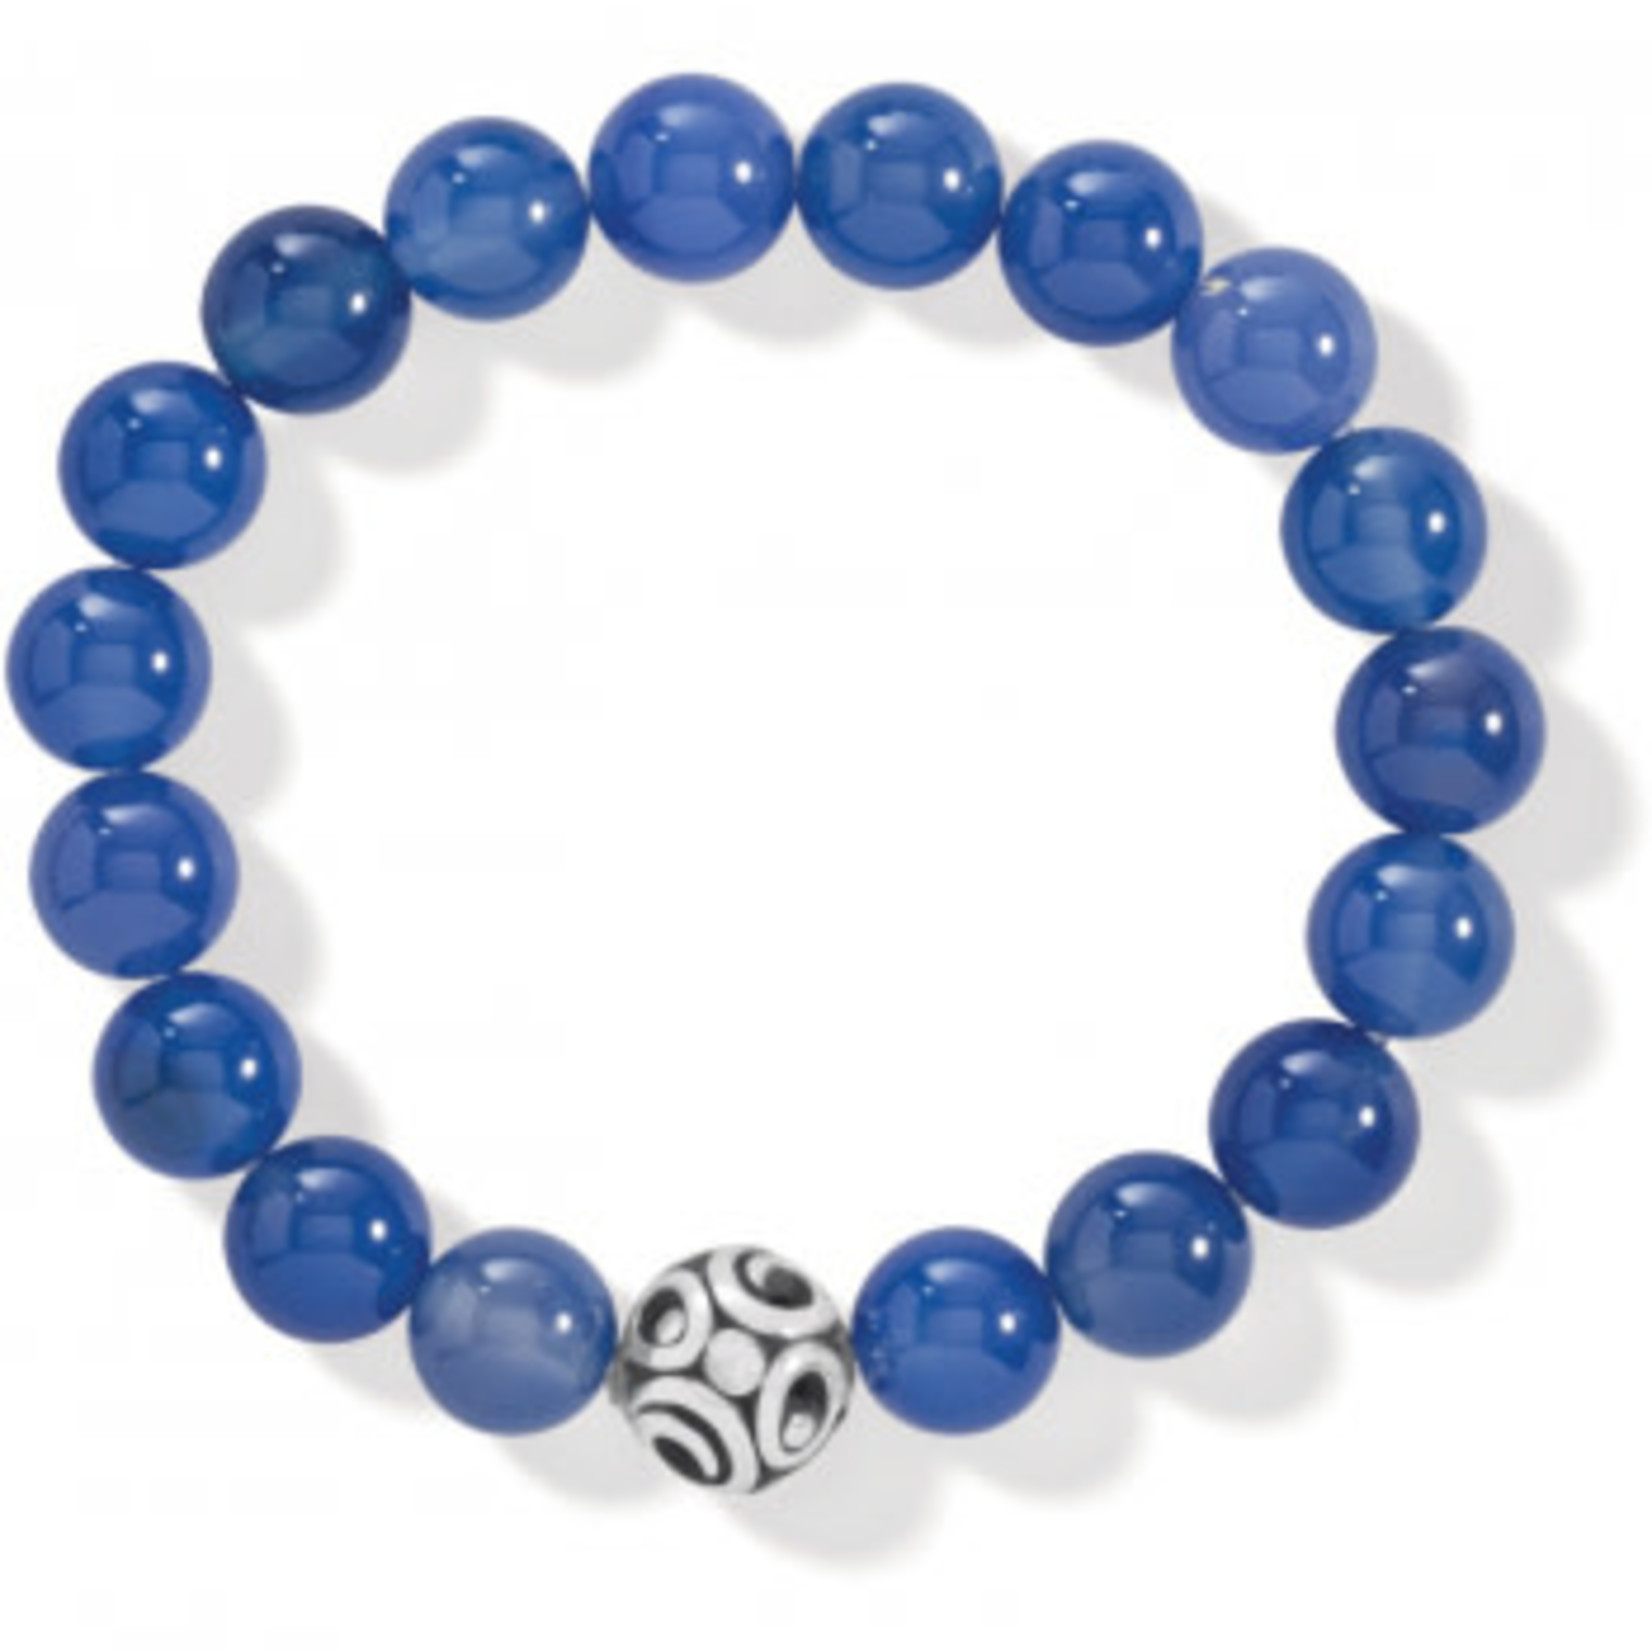 Brighton Contempo Chroma Blue Agate Stretch Bracelet